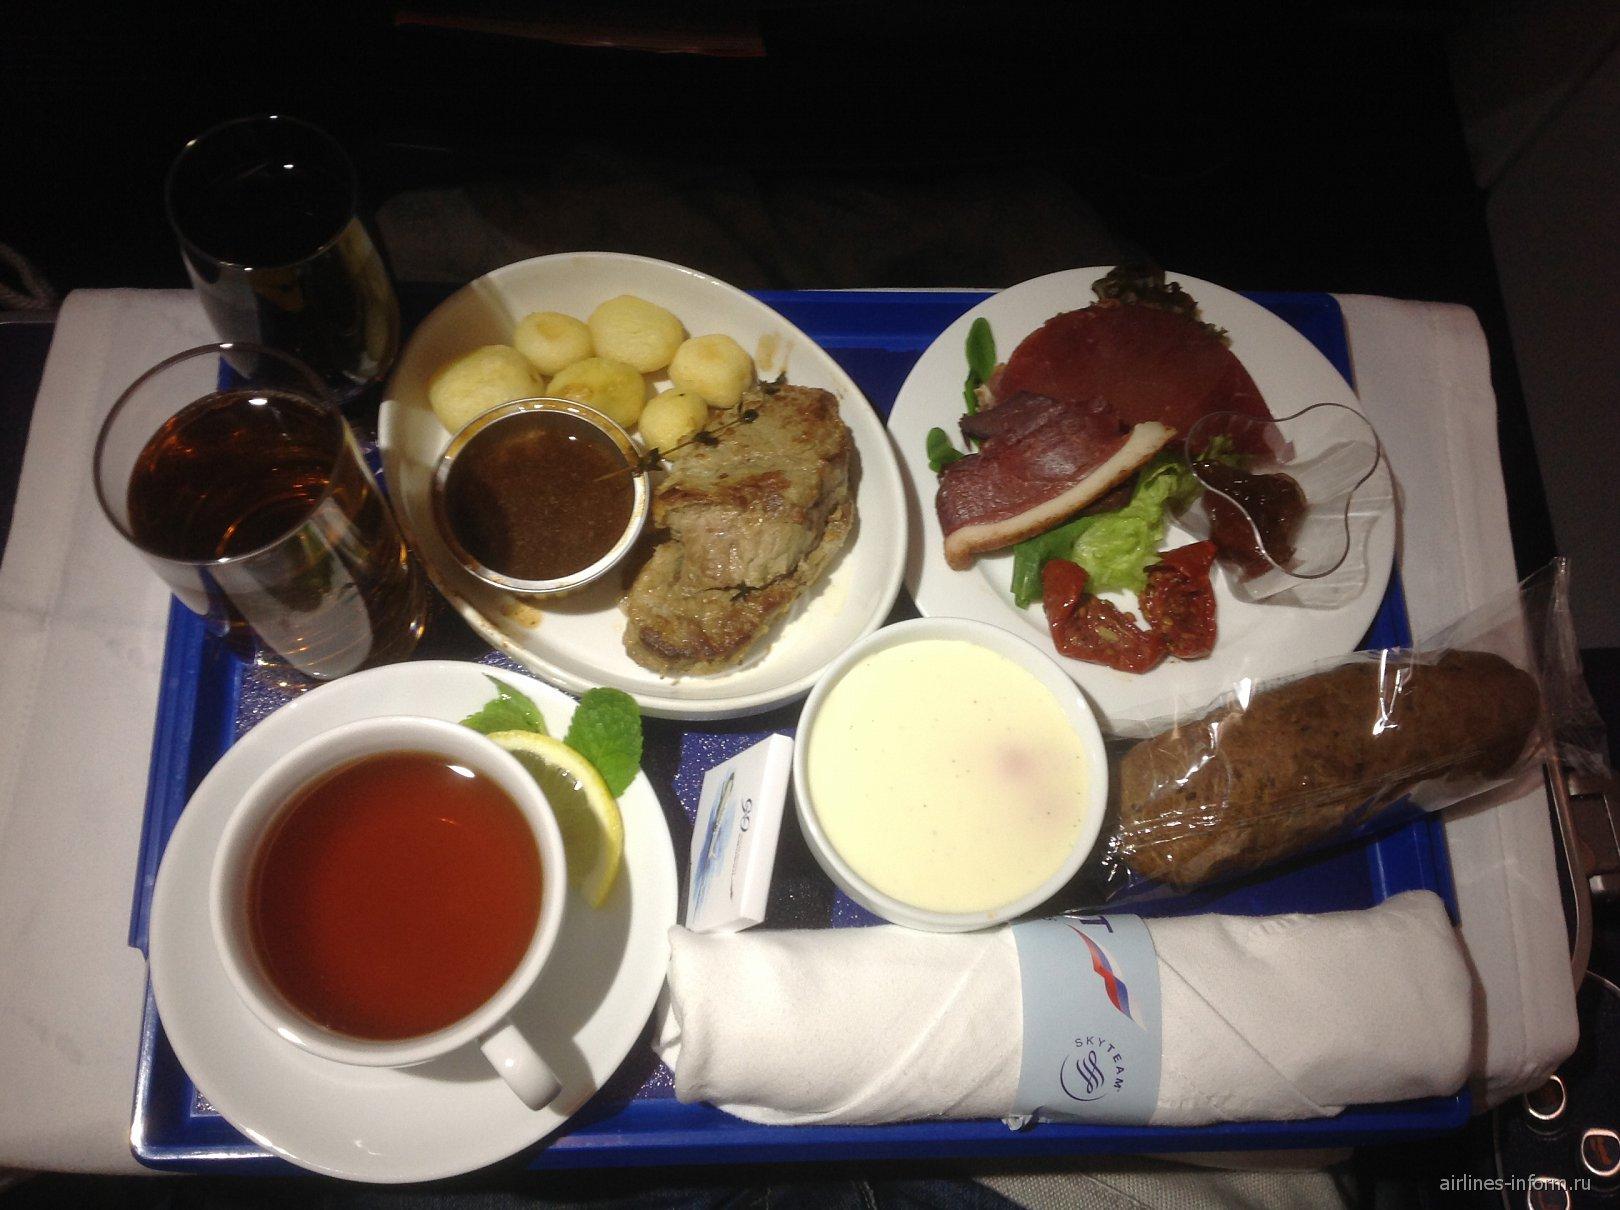 Питание бизнес-класса на рейсе Аэрофлота Санкт-Петербург-Москва